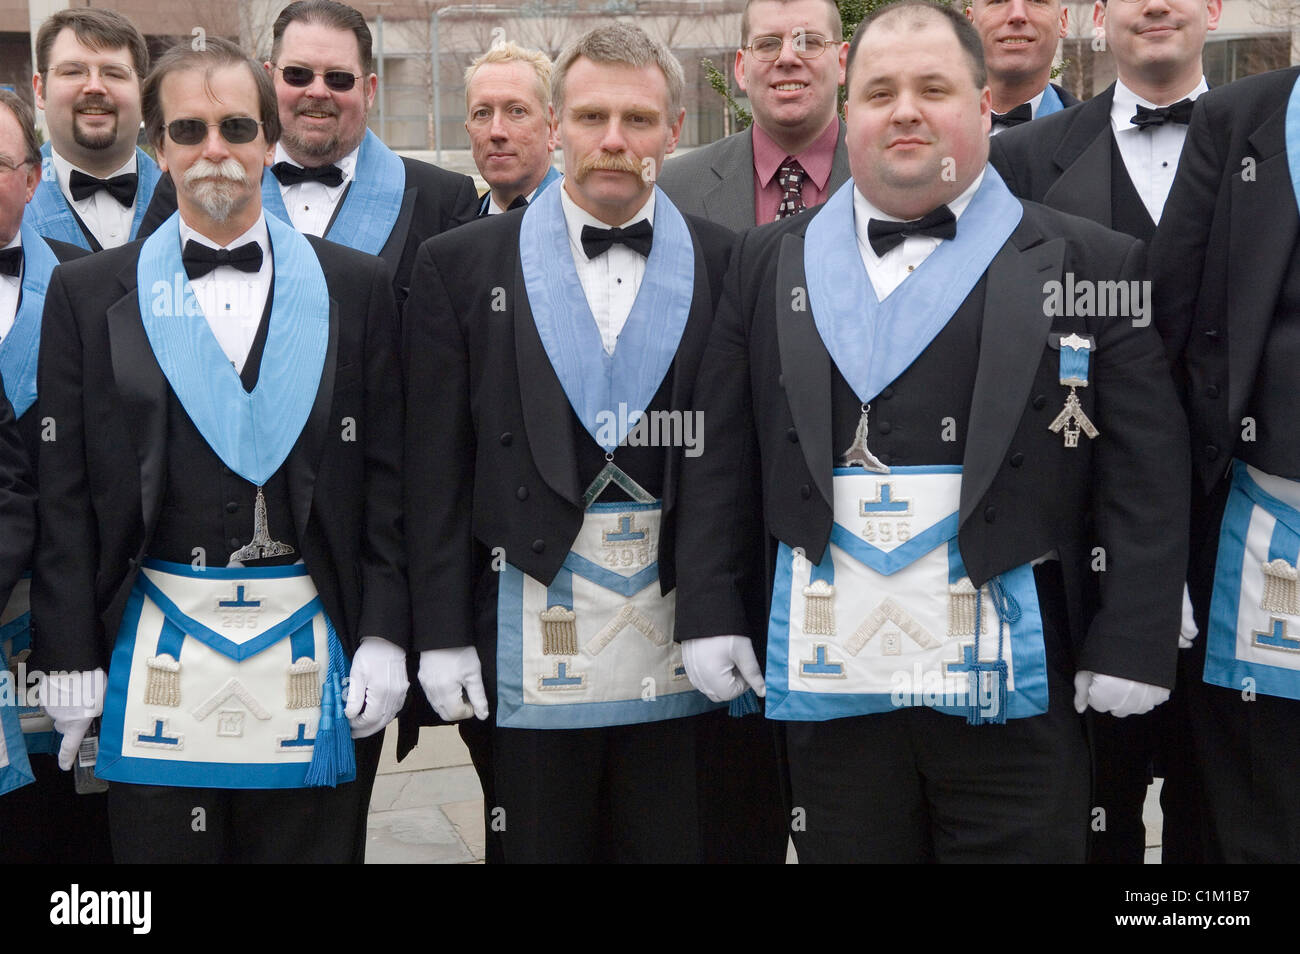 The Freemasons Stock Photos & The Freemasons Stock Images